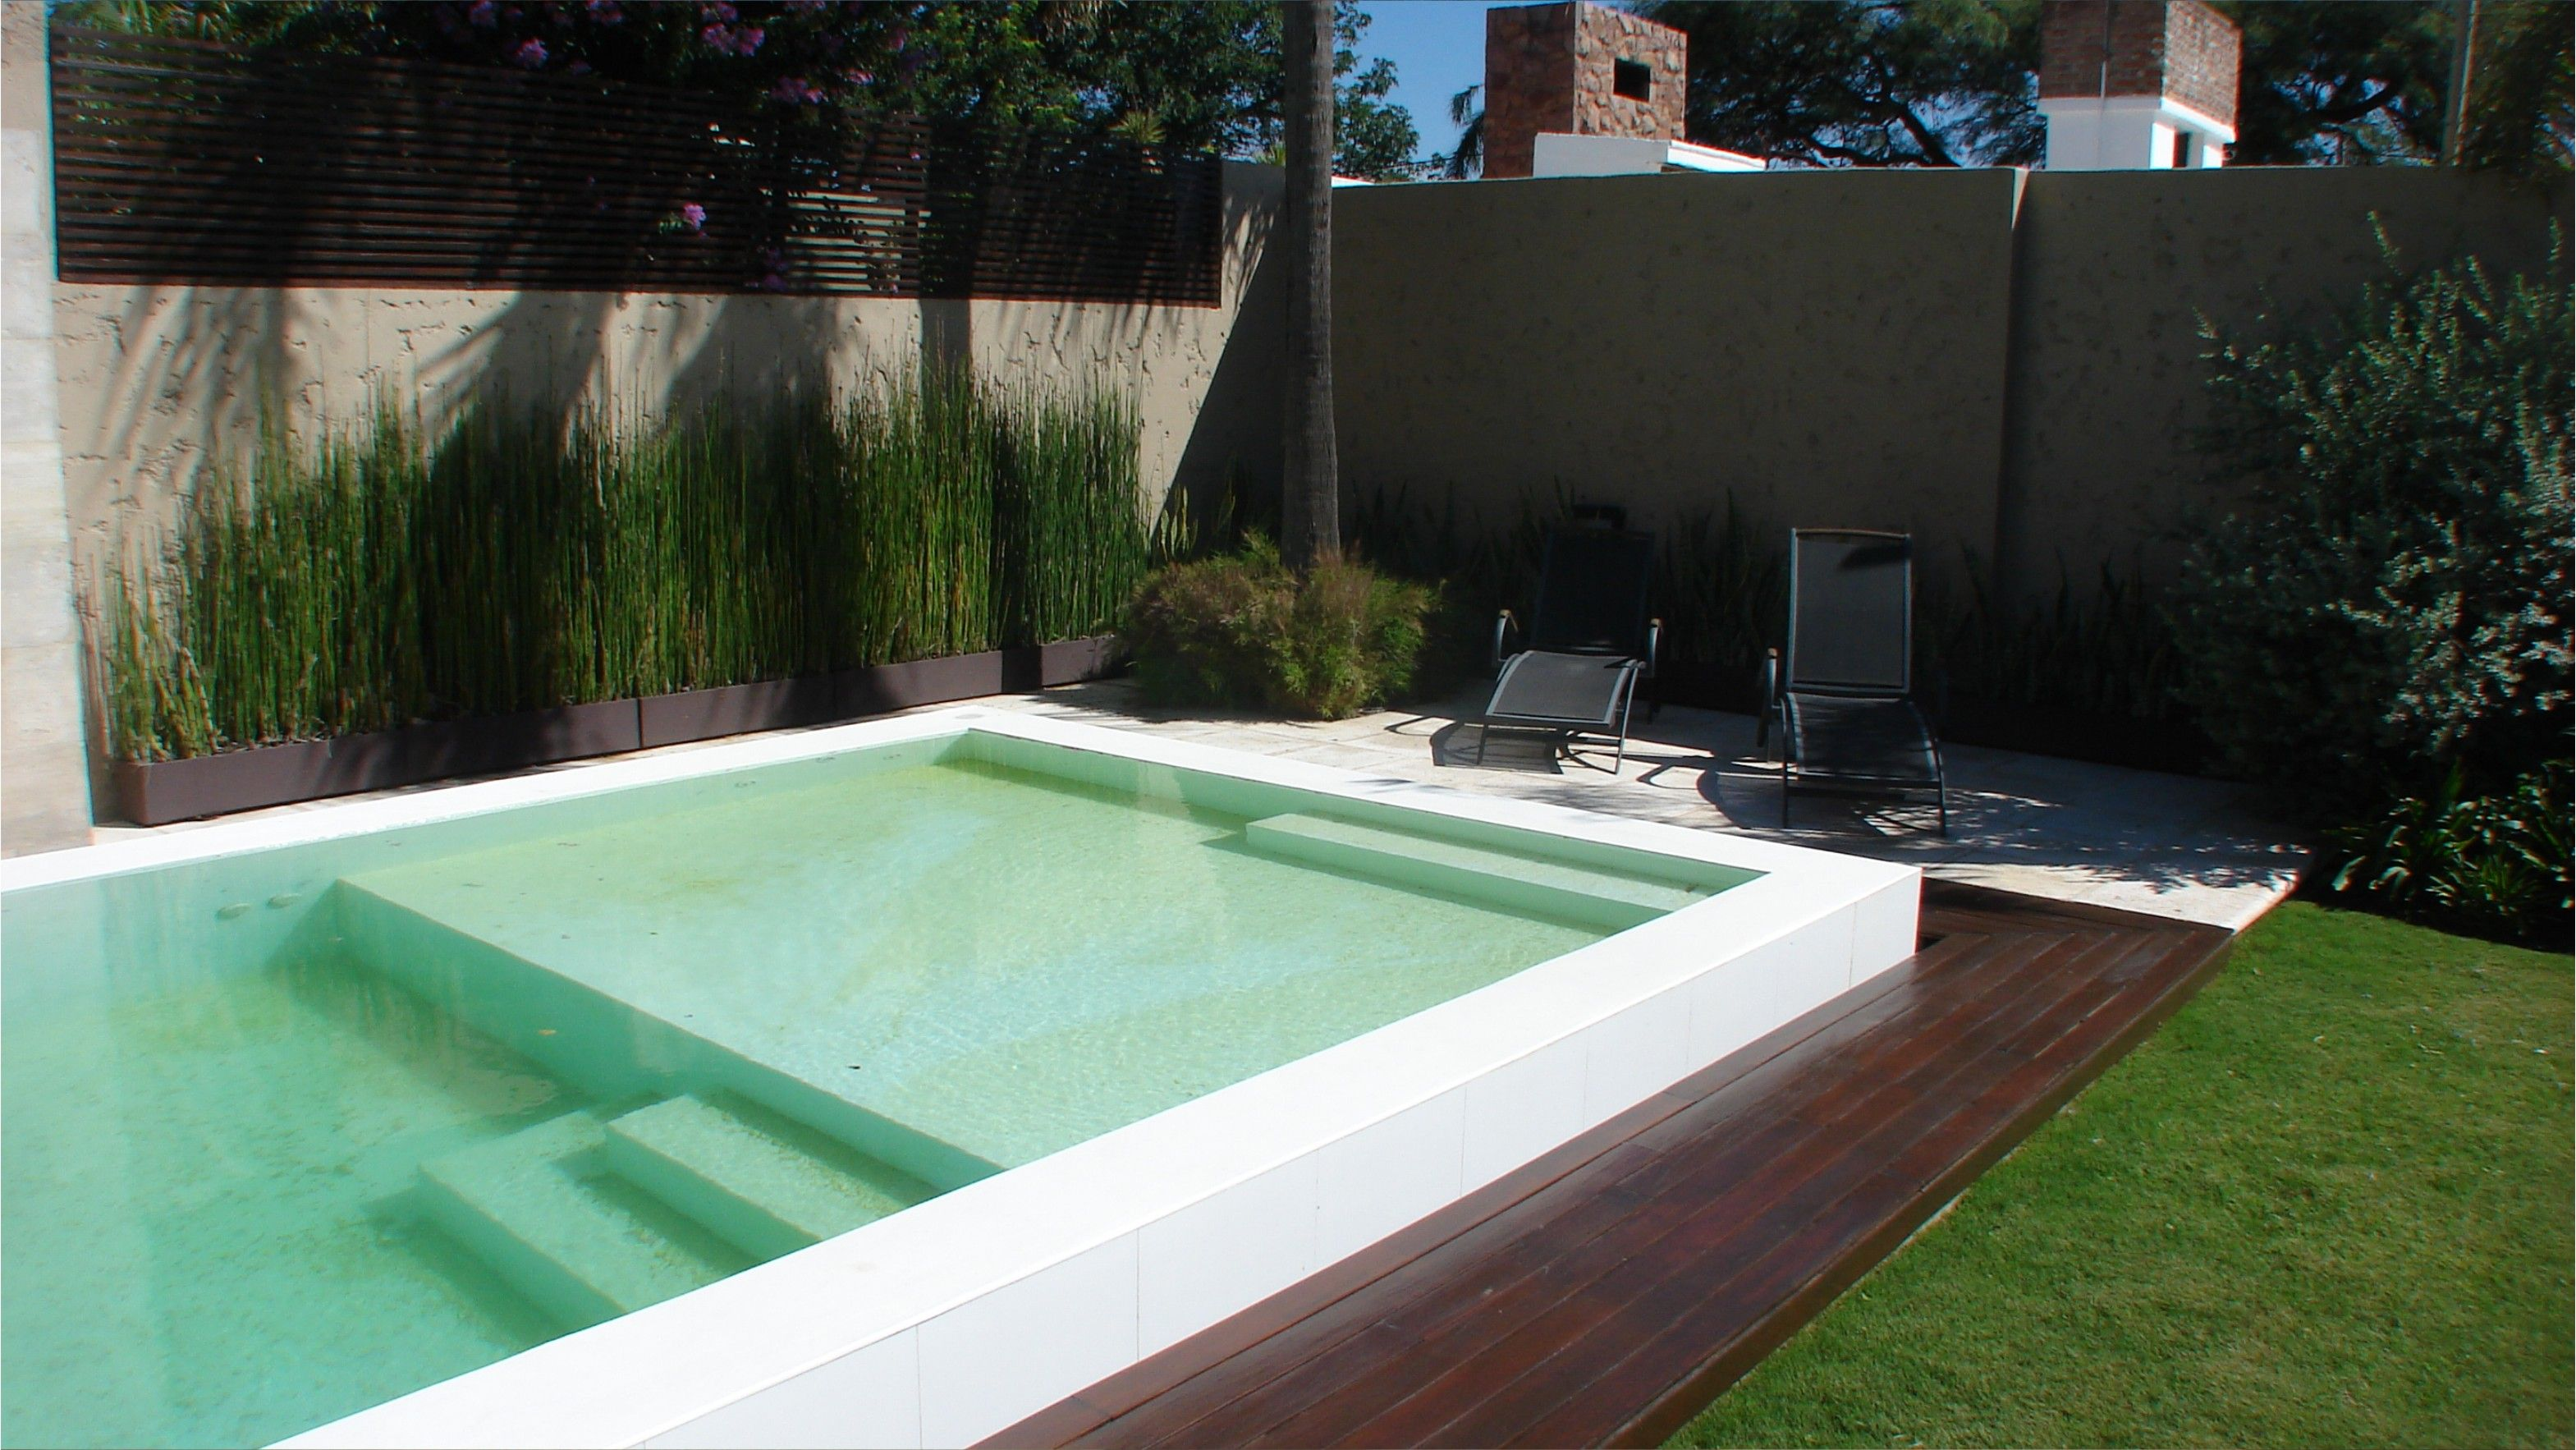 Piscina desborde finlandes deck piscina for Diseno piscina